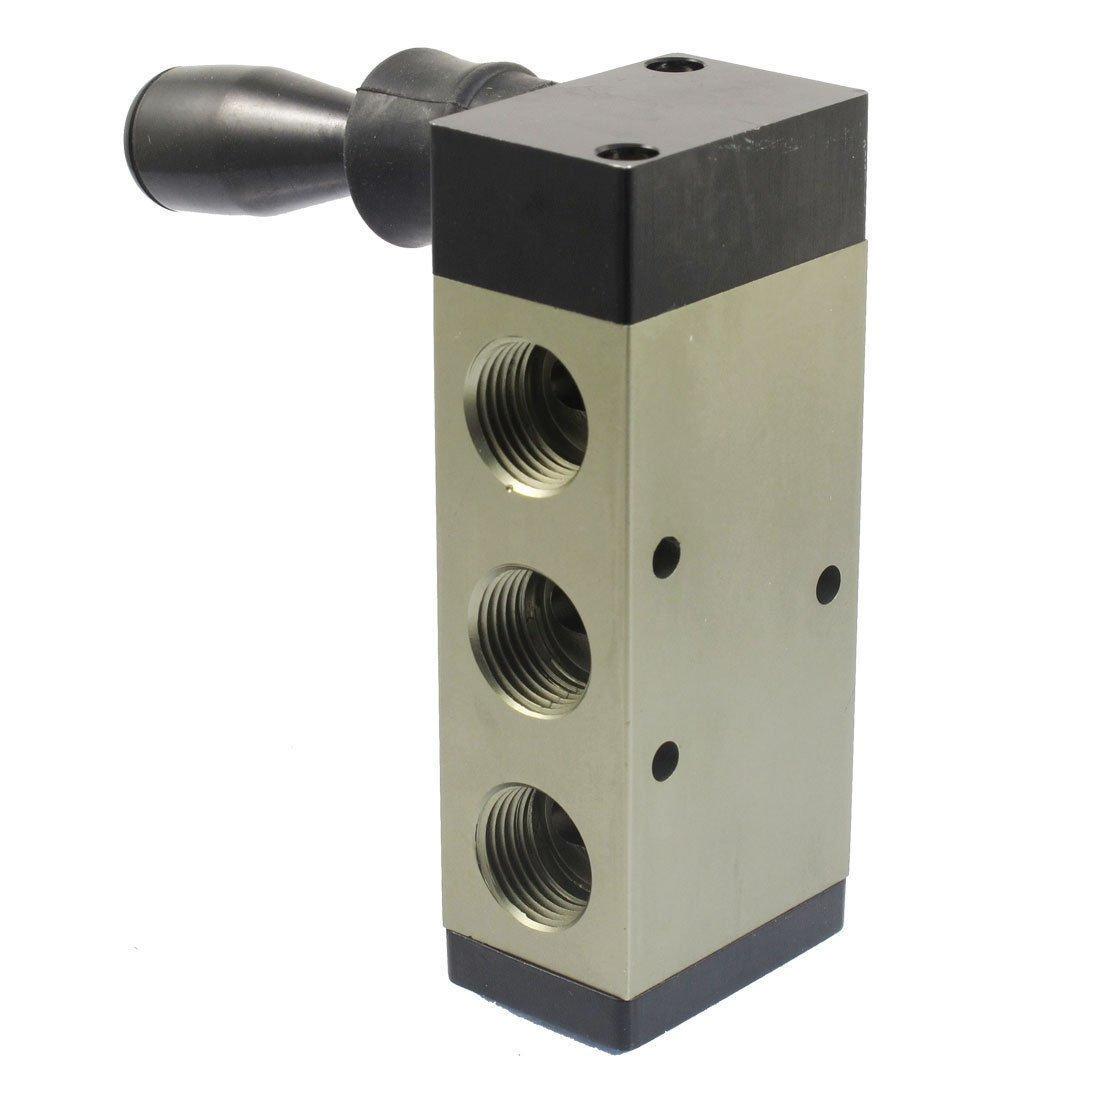 "5 Port 2 Position Manual Hand Pull Valve 1/2""PT Inlet Outlet 4H410-15"